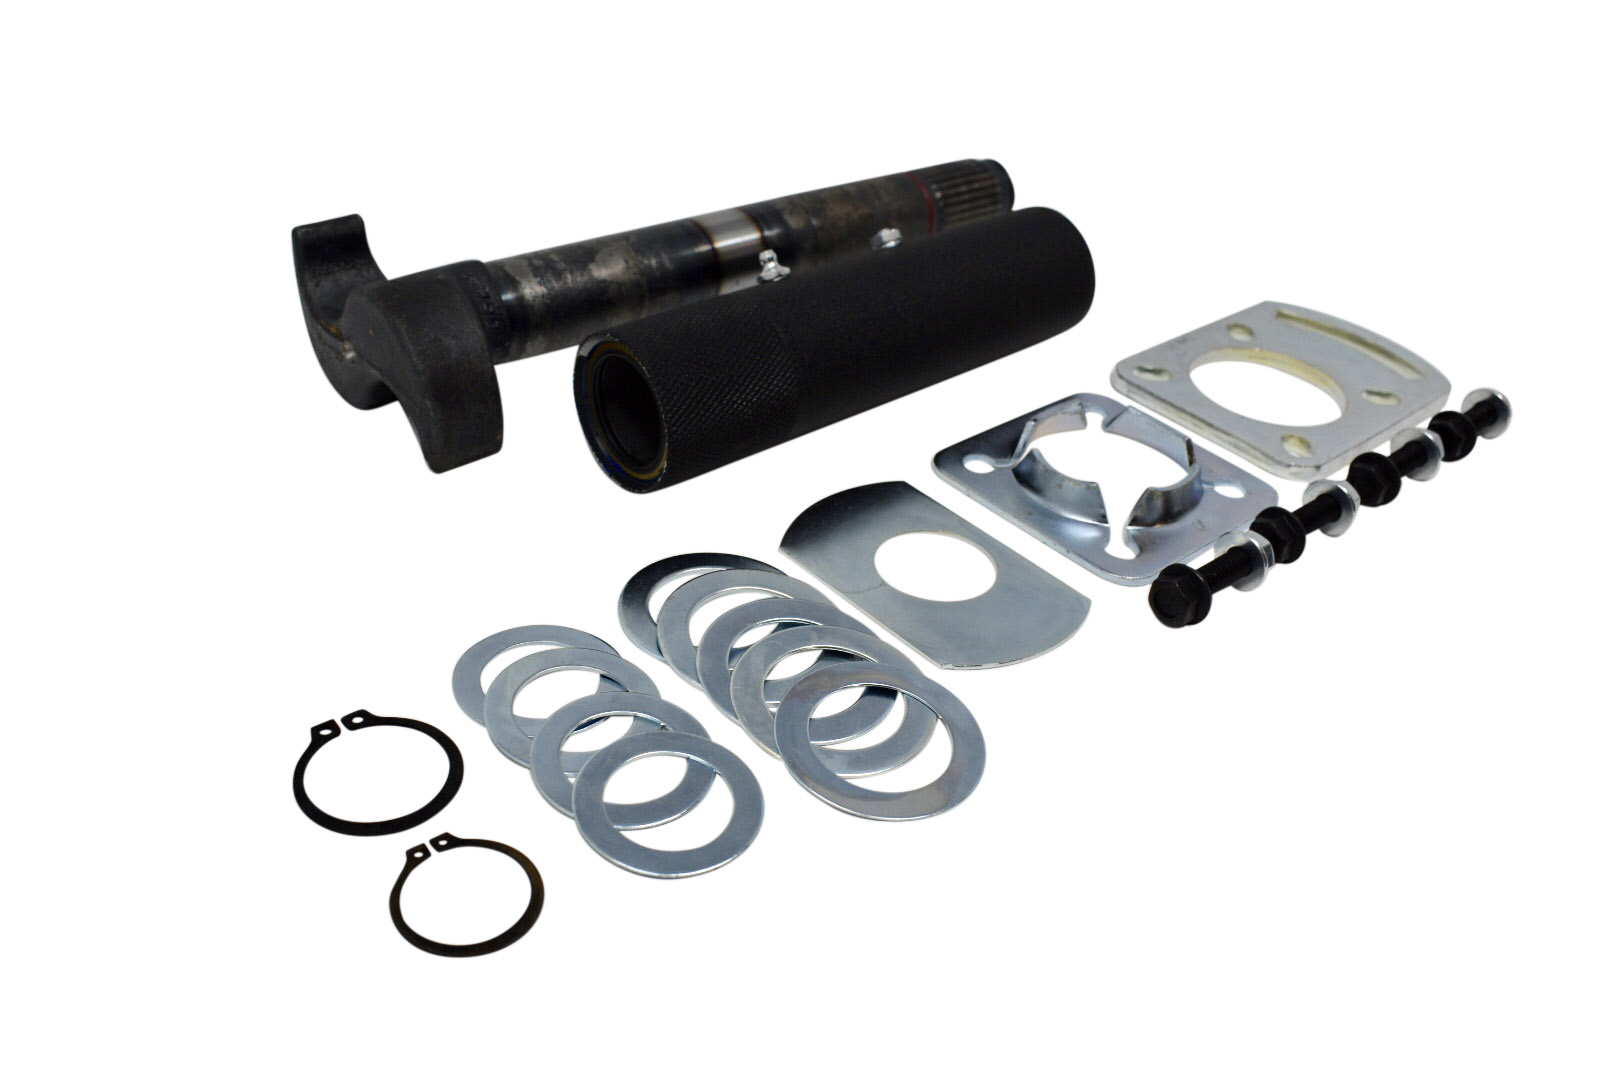 "Cam Tube c1311a-l: extreme s-cam bushing kit (11-1/32"" s-cam bushing kit, 2-1/8"" bore, left-hand)"